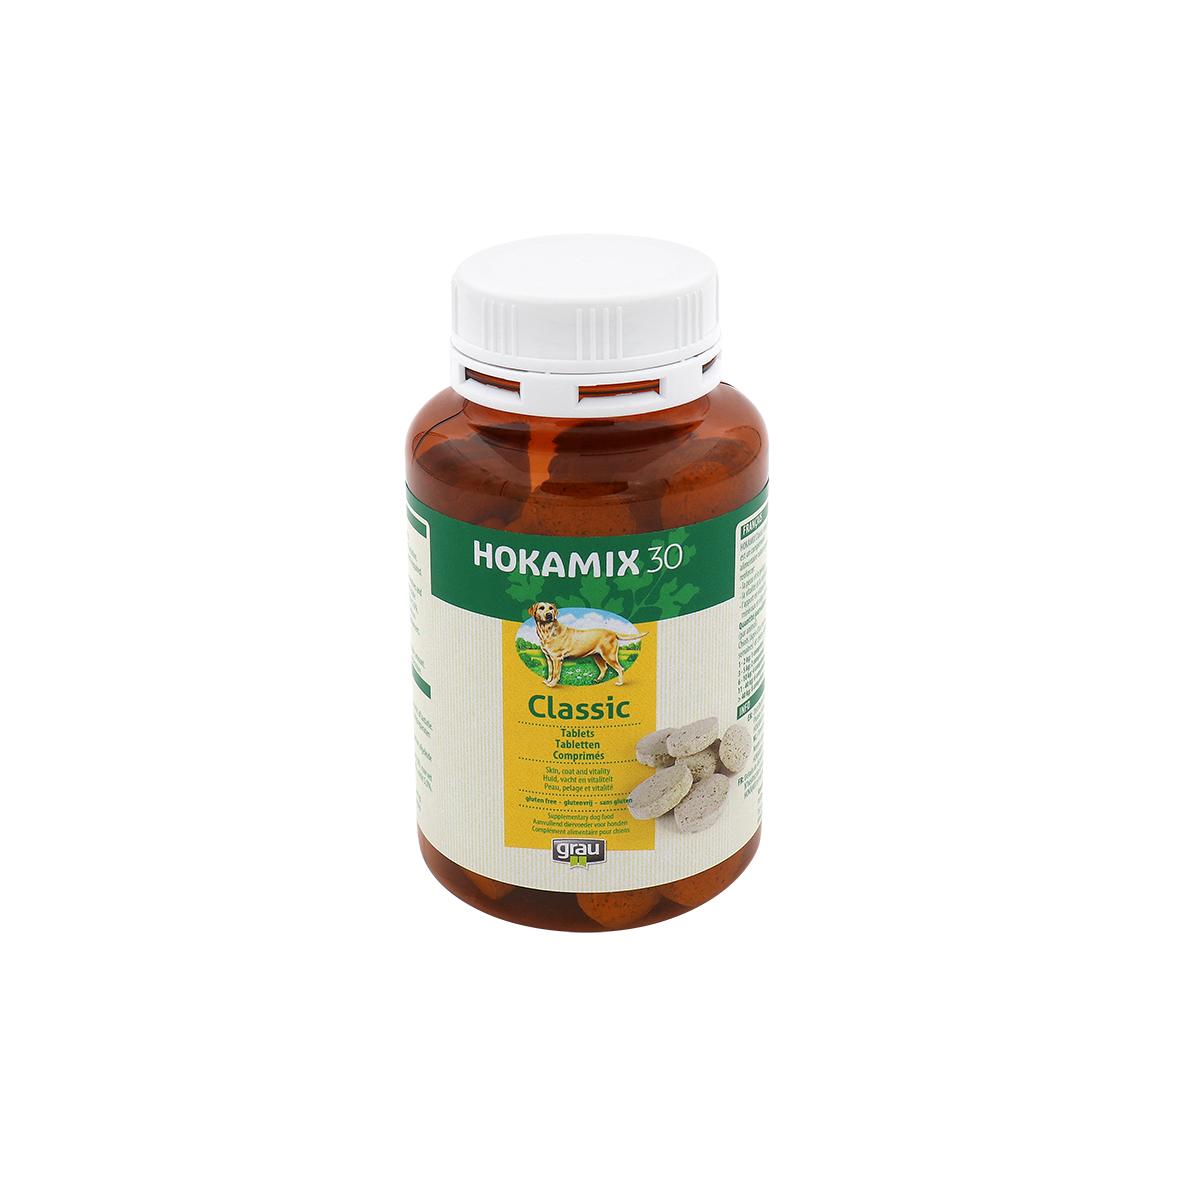 HOKAMIX Classic tabletten